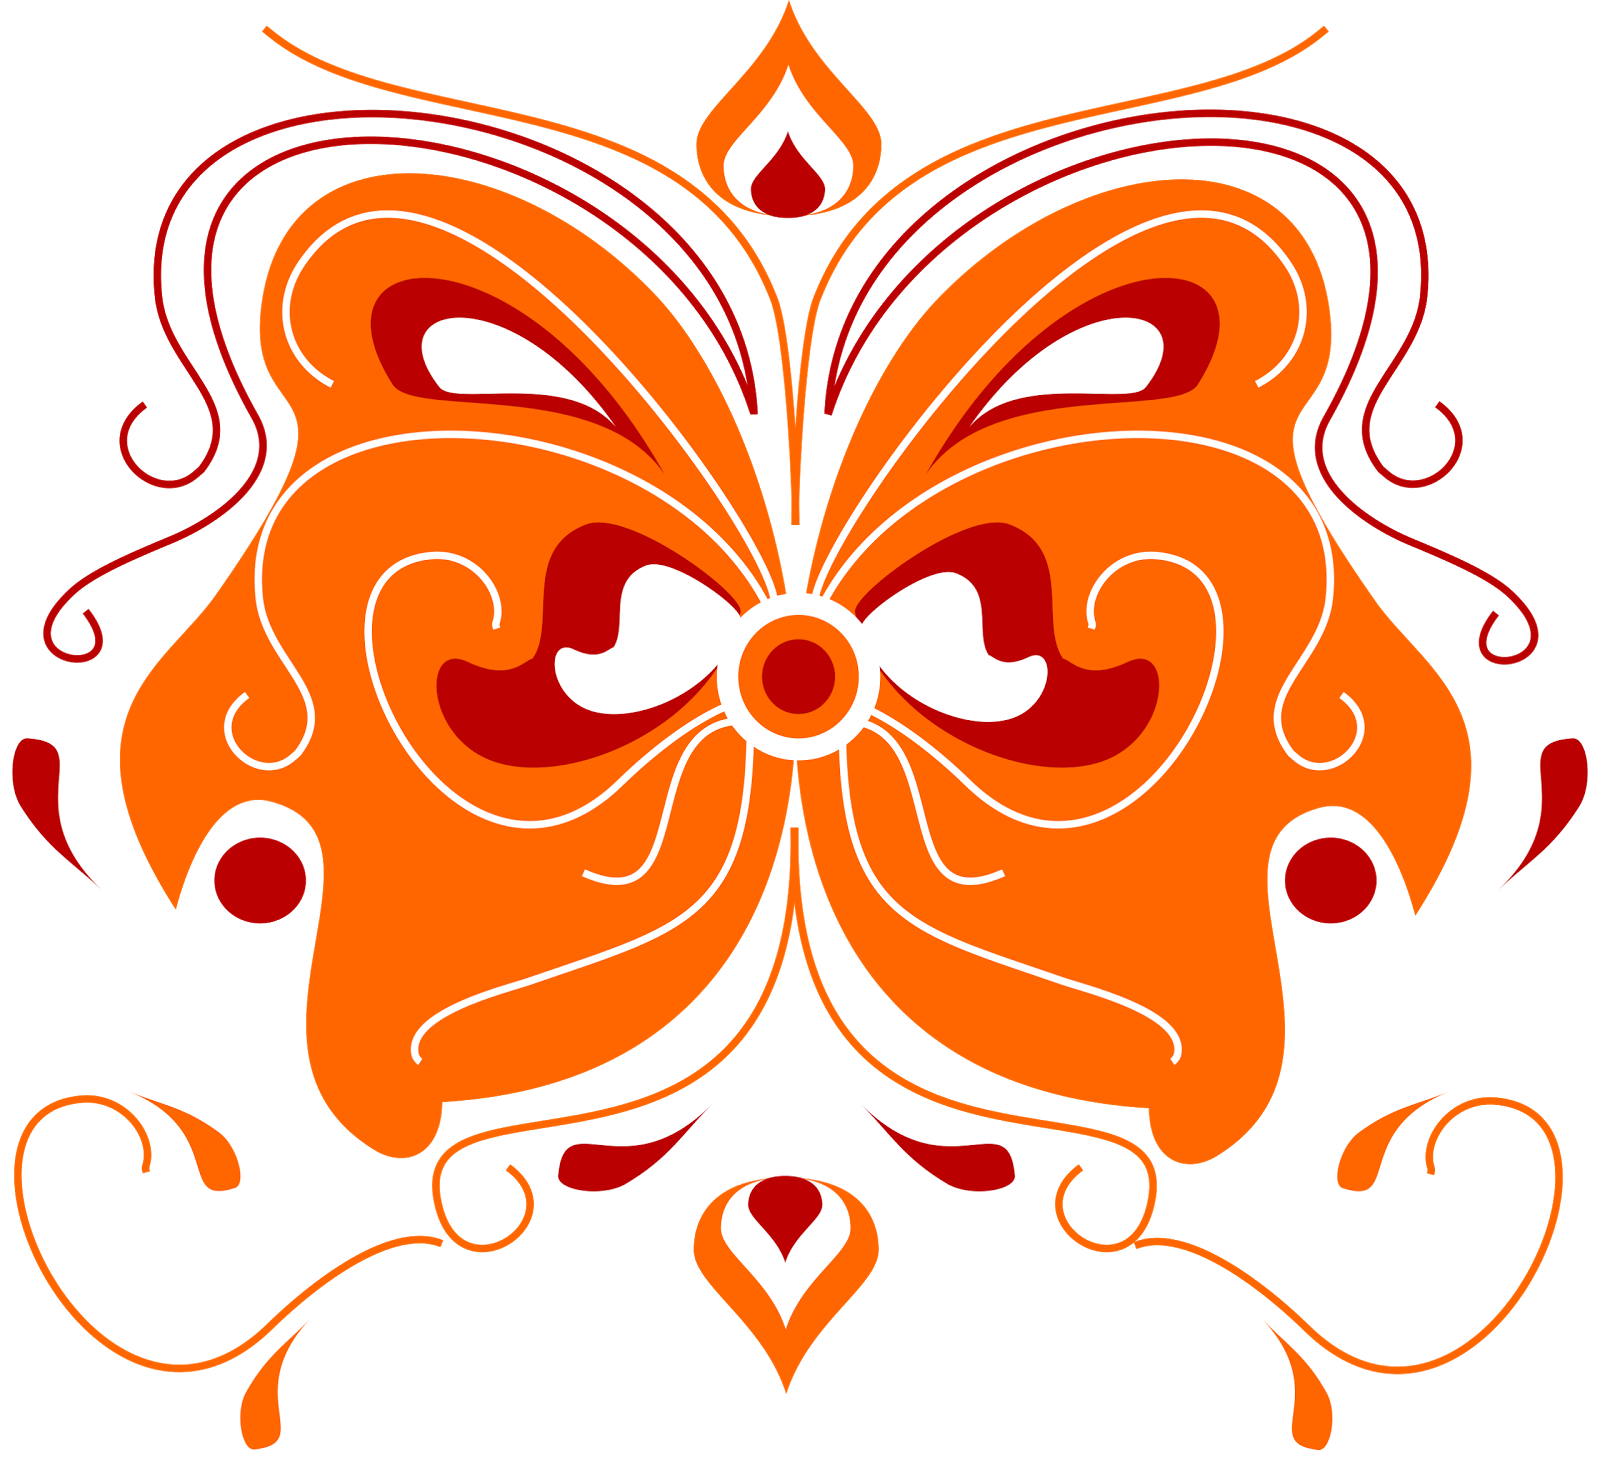 Corel Draw Designs Images | Joy Studio Design Gallery - Best Design